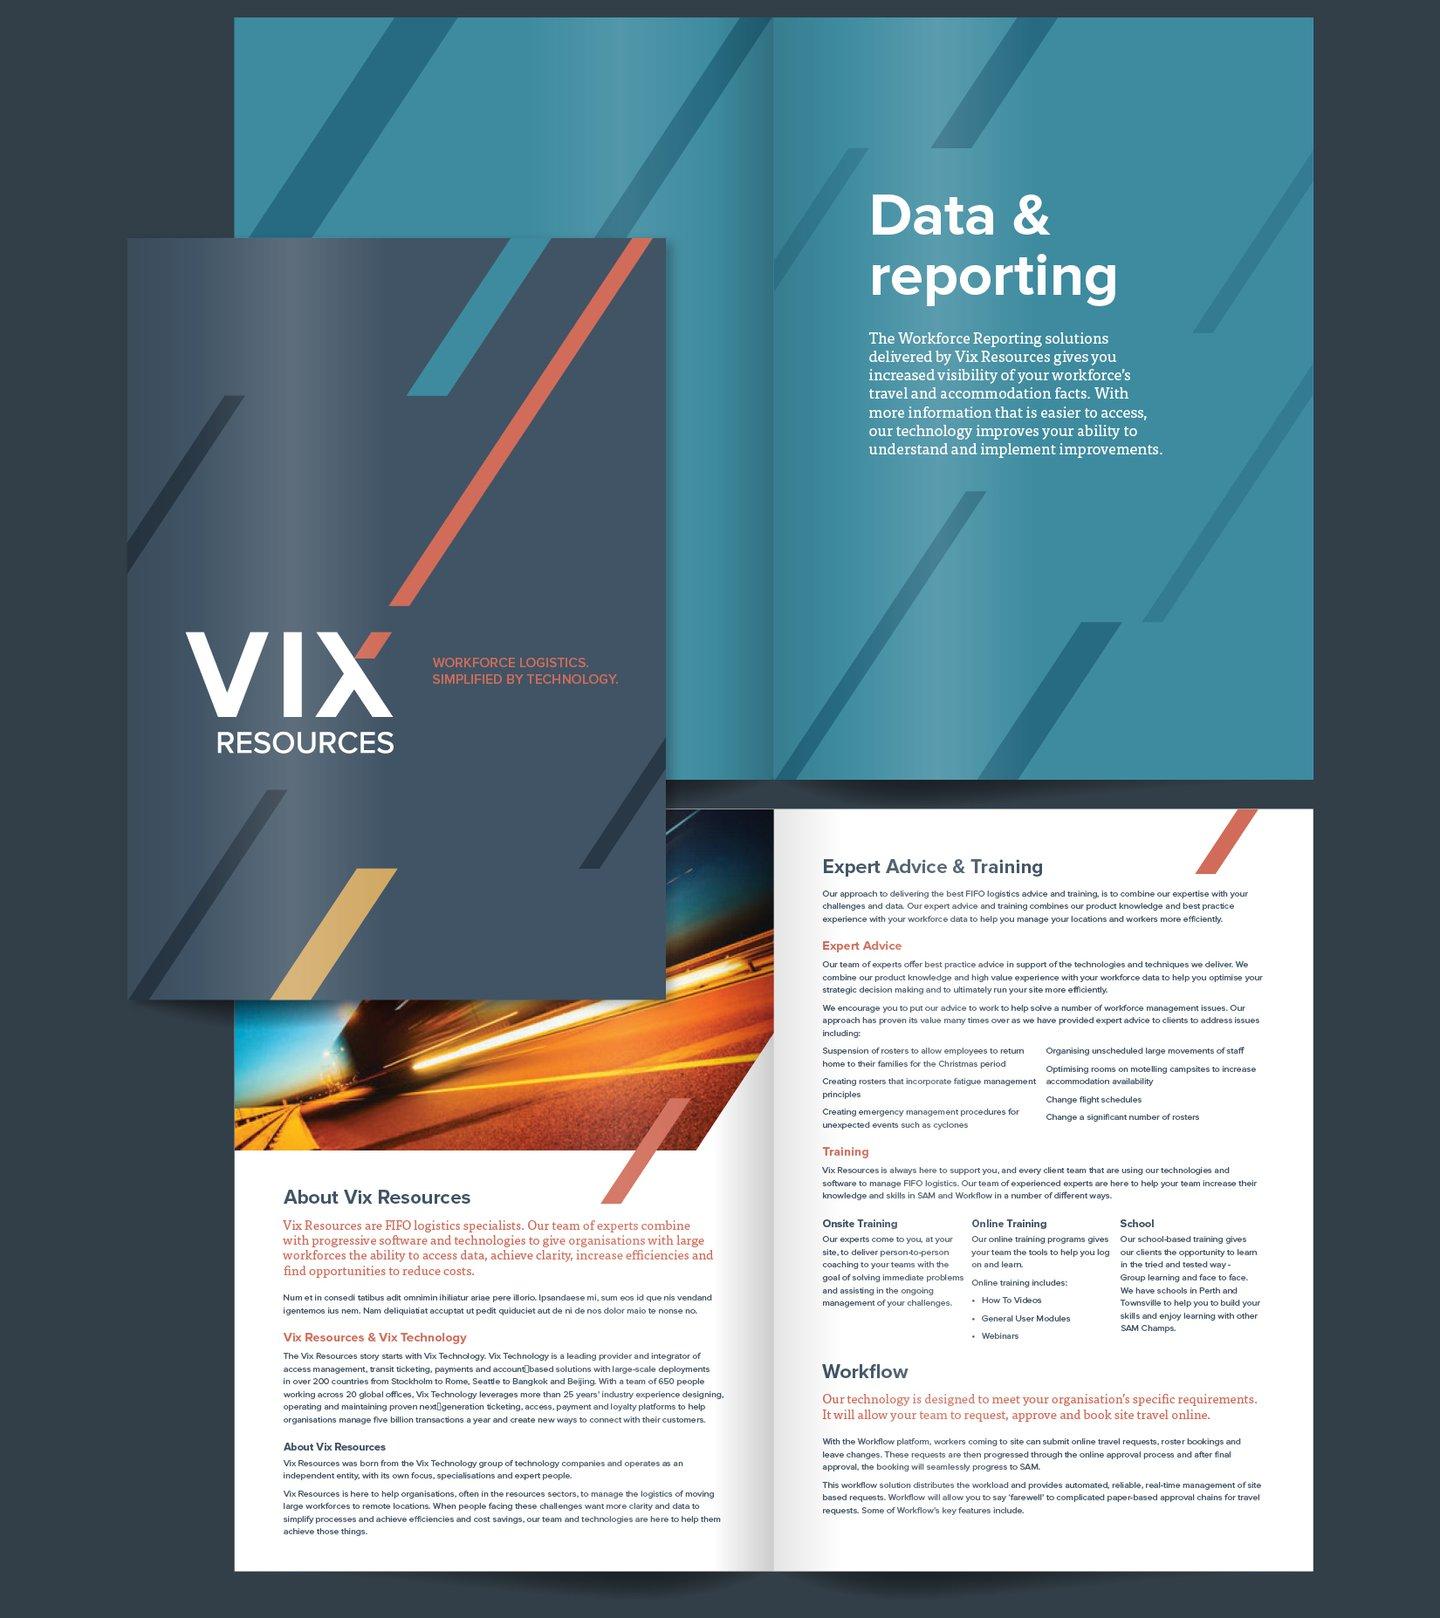 Vix-Project-v2-4.jpg